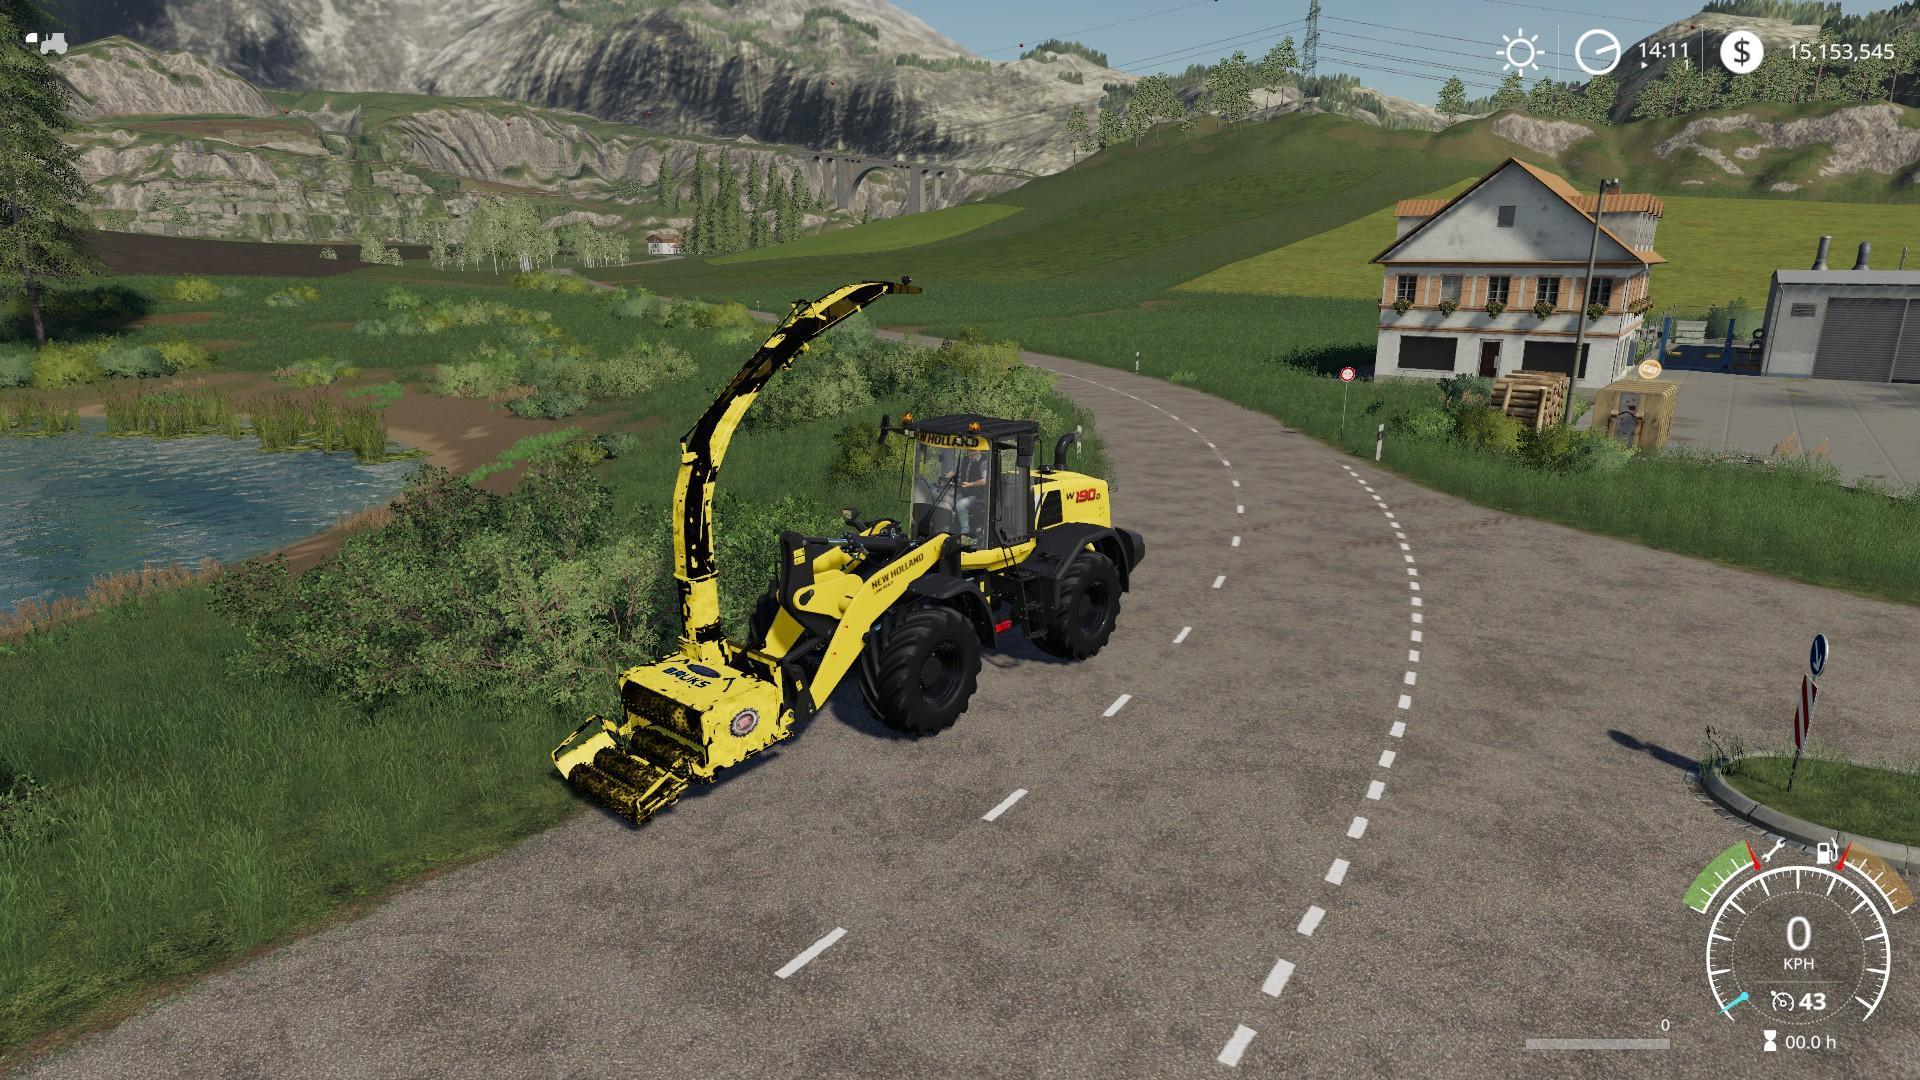 Bruks All In One v1 3 LS 2019 - Farming simulator 17 / 2017 mod